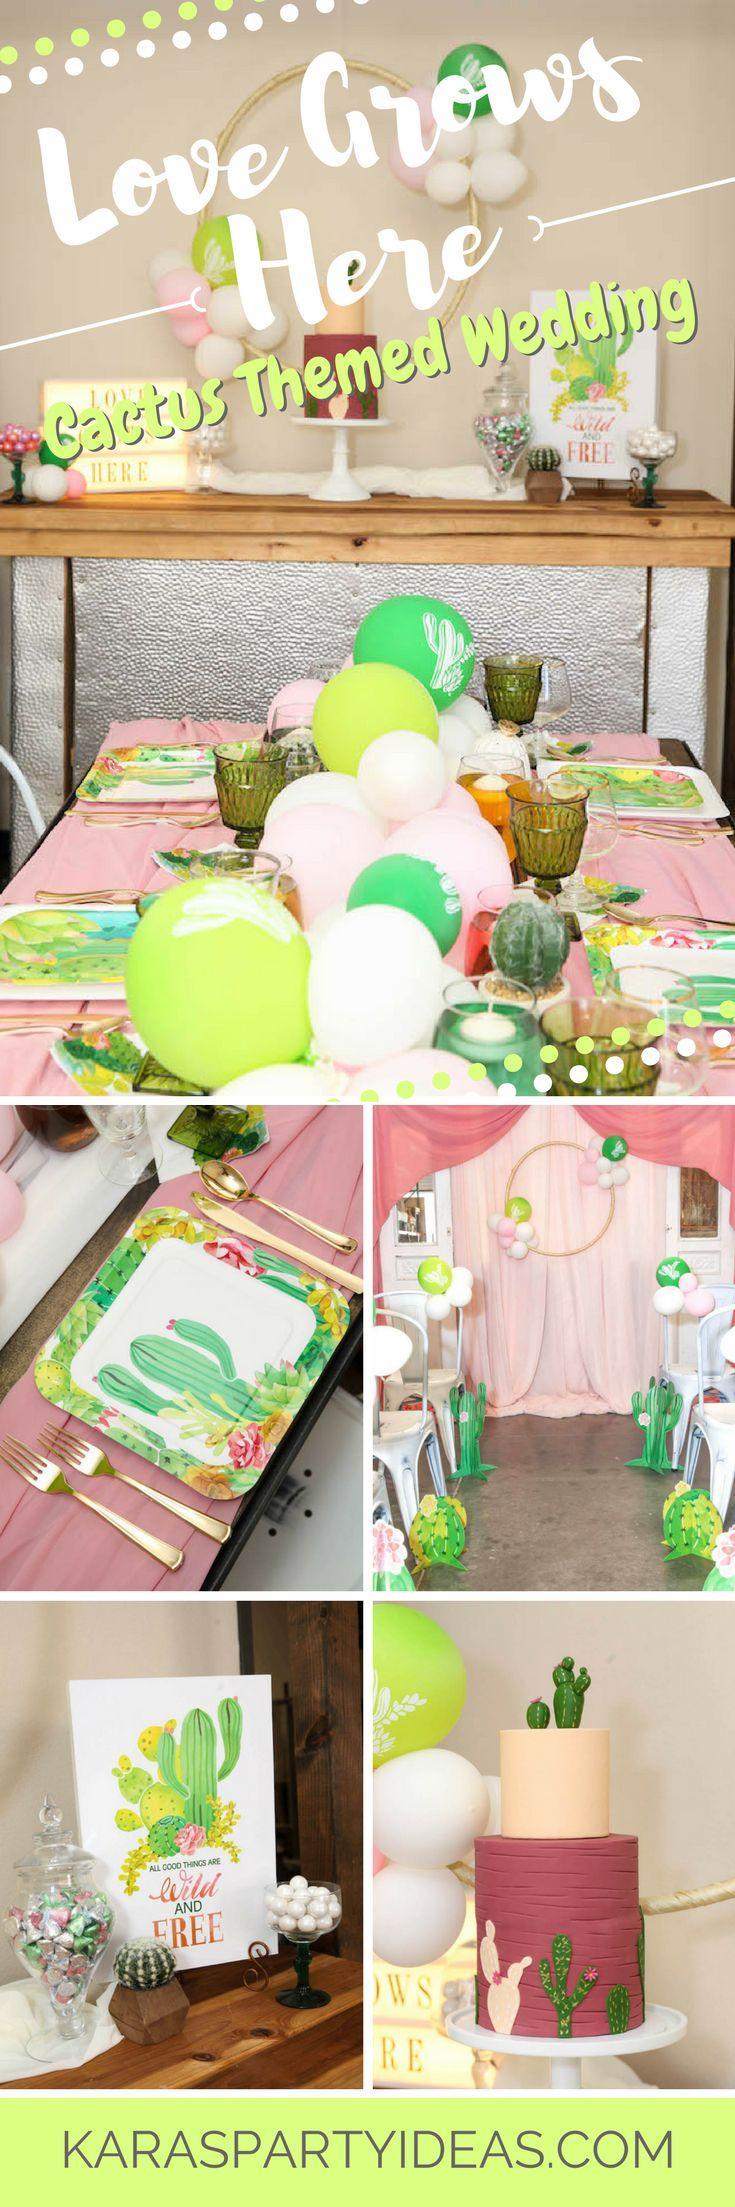 Kara s party ideas rustic country barn wedding party ideas supplies - Love Grows Here Cactus Themed Wedding Via Kara S Party Ideas Karaspartyideas Com